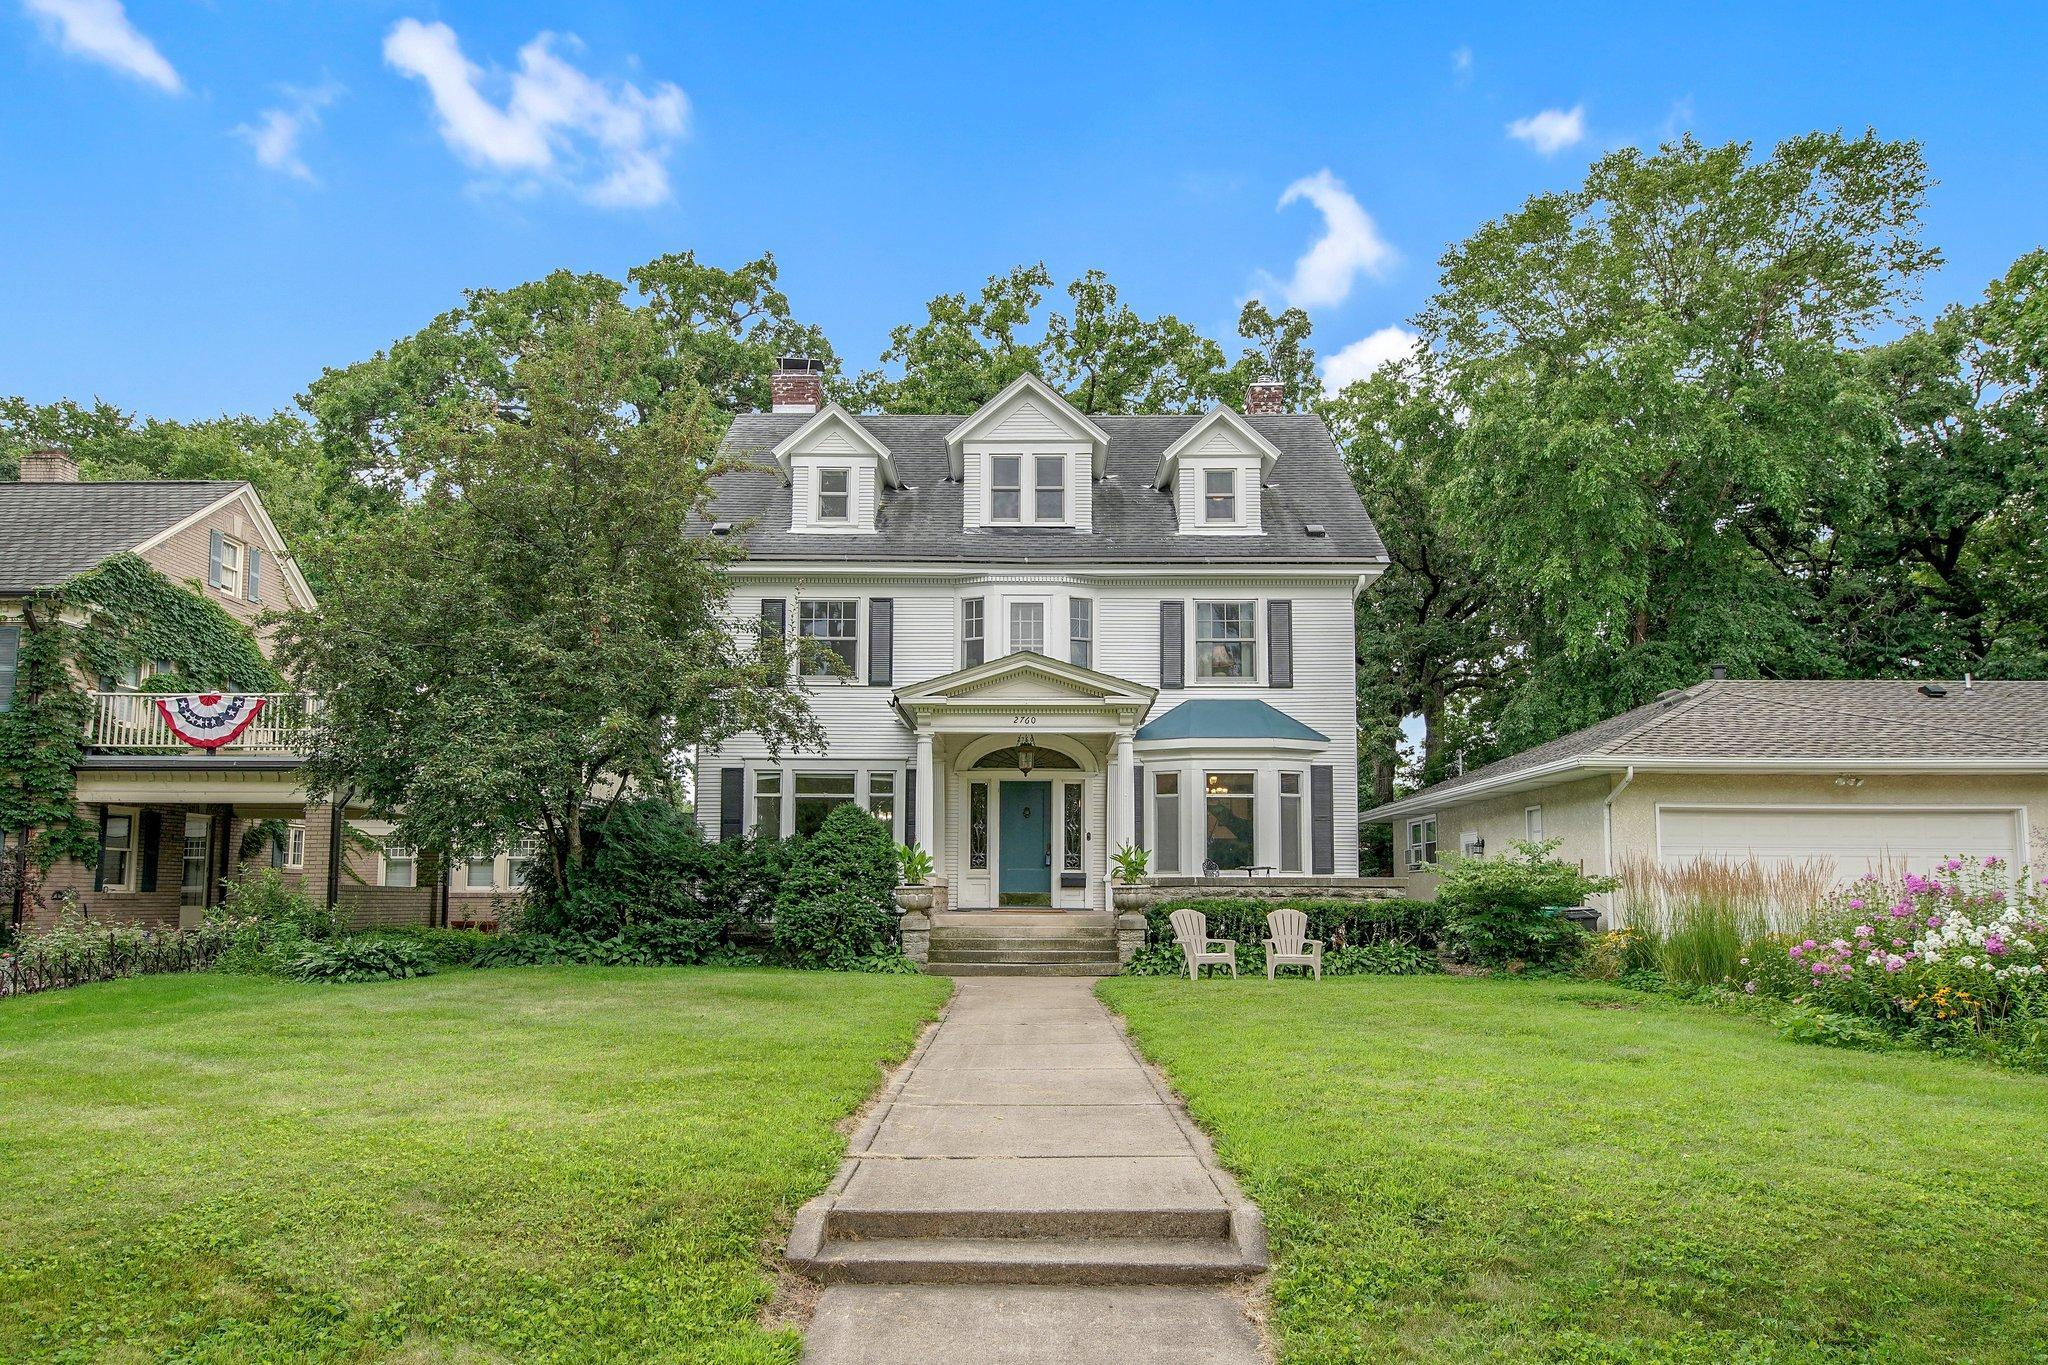 2760 W River Parkway Property Photo - Minneapolis, MN real estate listing